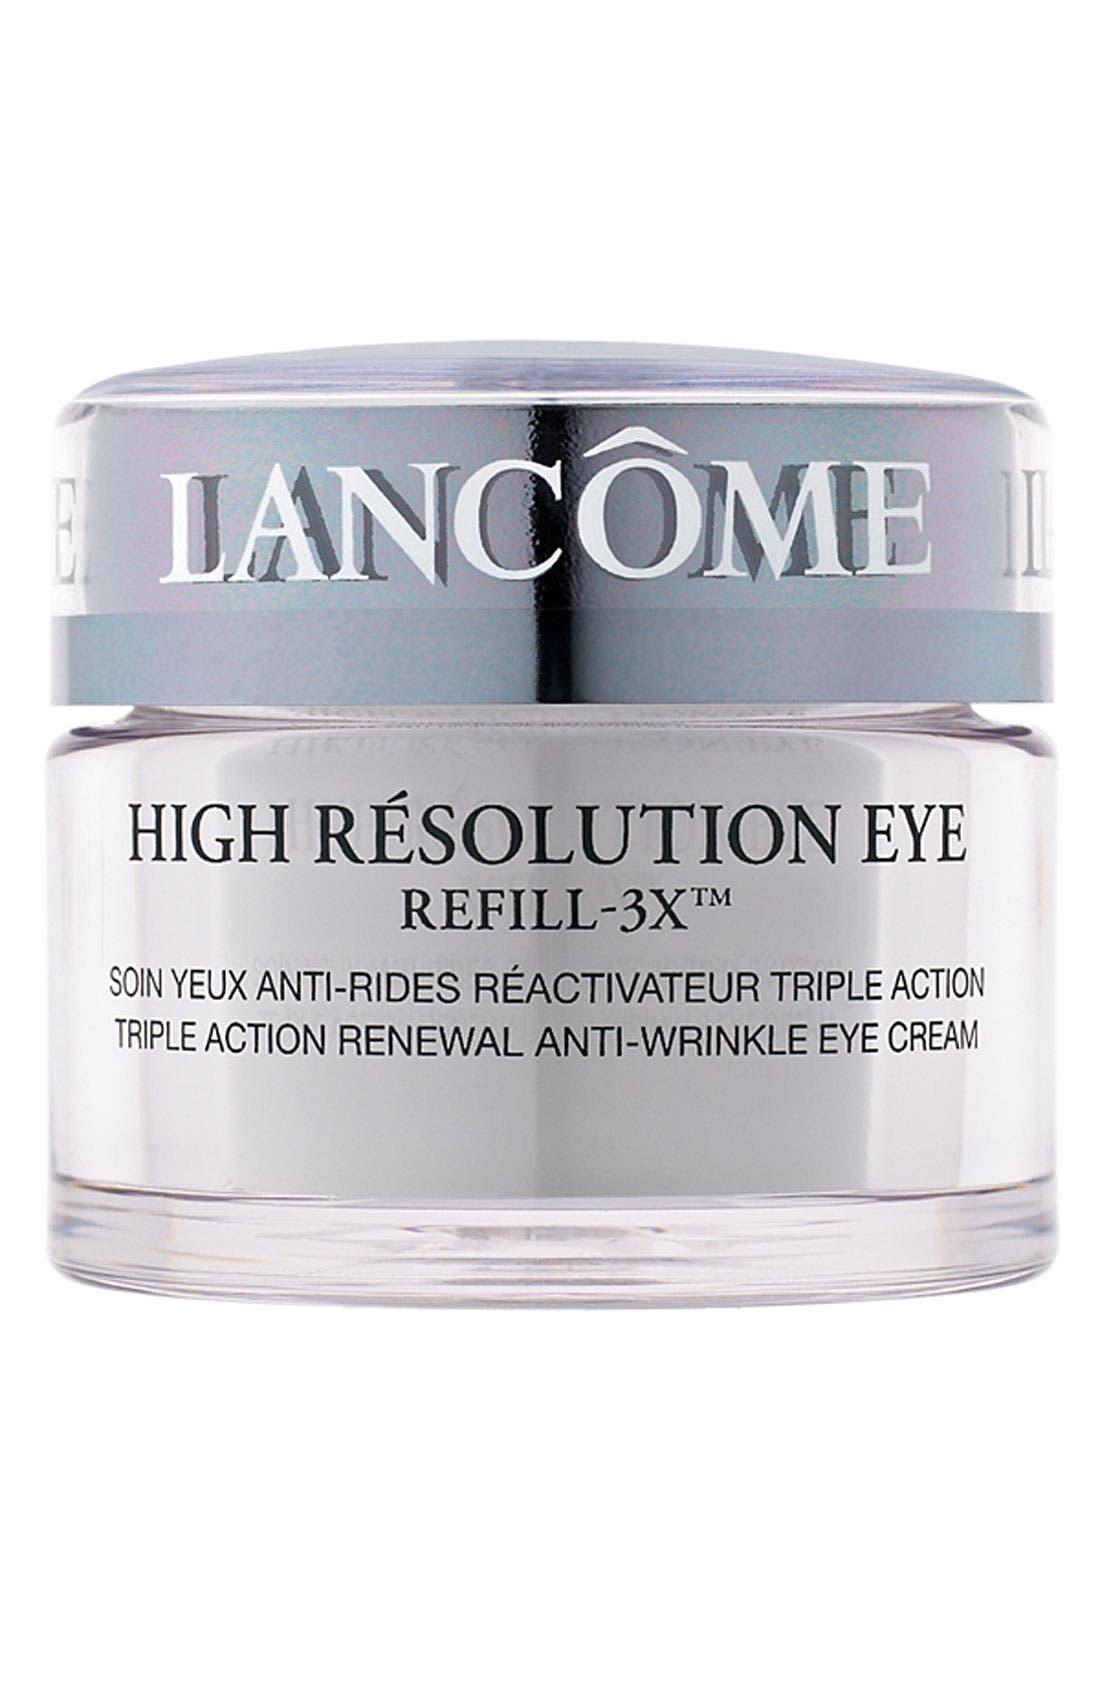 LANCÔME, High Résolution Refill-3X Anti-Wrinkle Eye Cream, Main thumbnail 1, color, NO COLOR